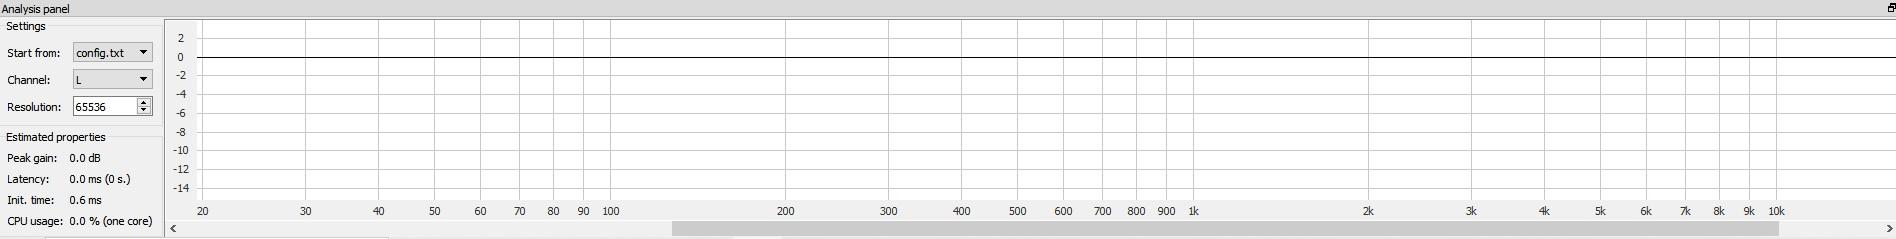 Analysis Panel (a).jpg